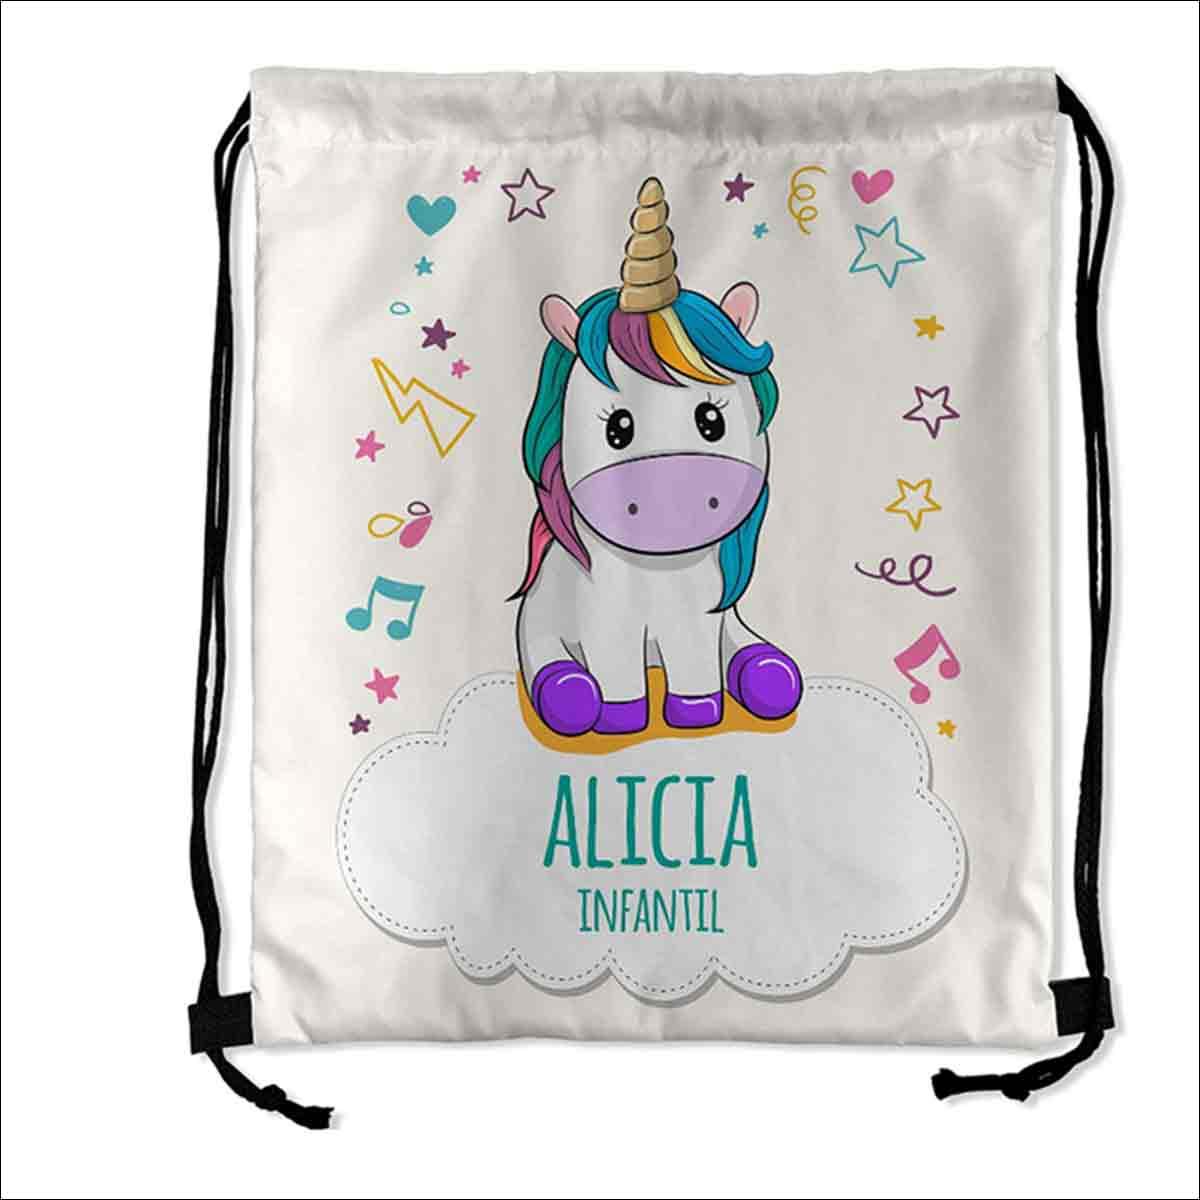 mochila personalizada nfantiles